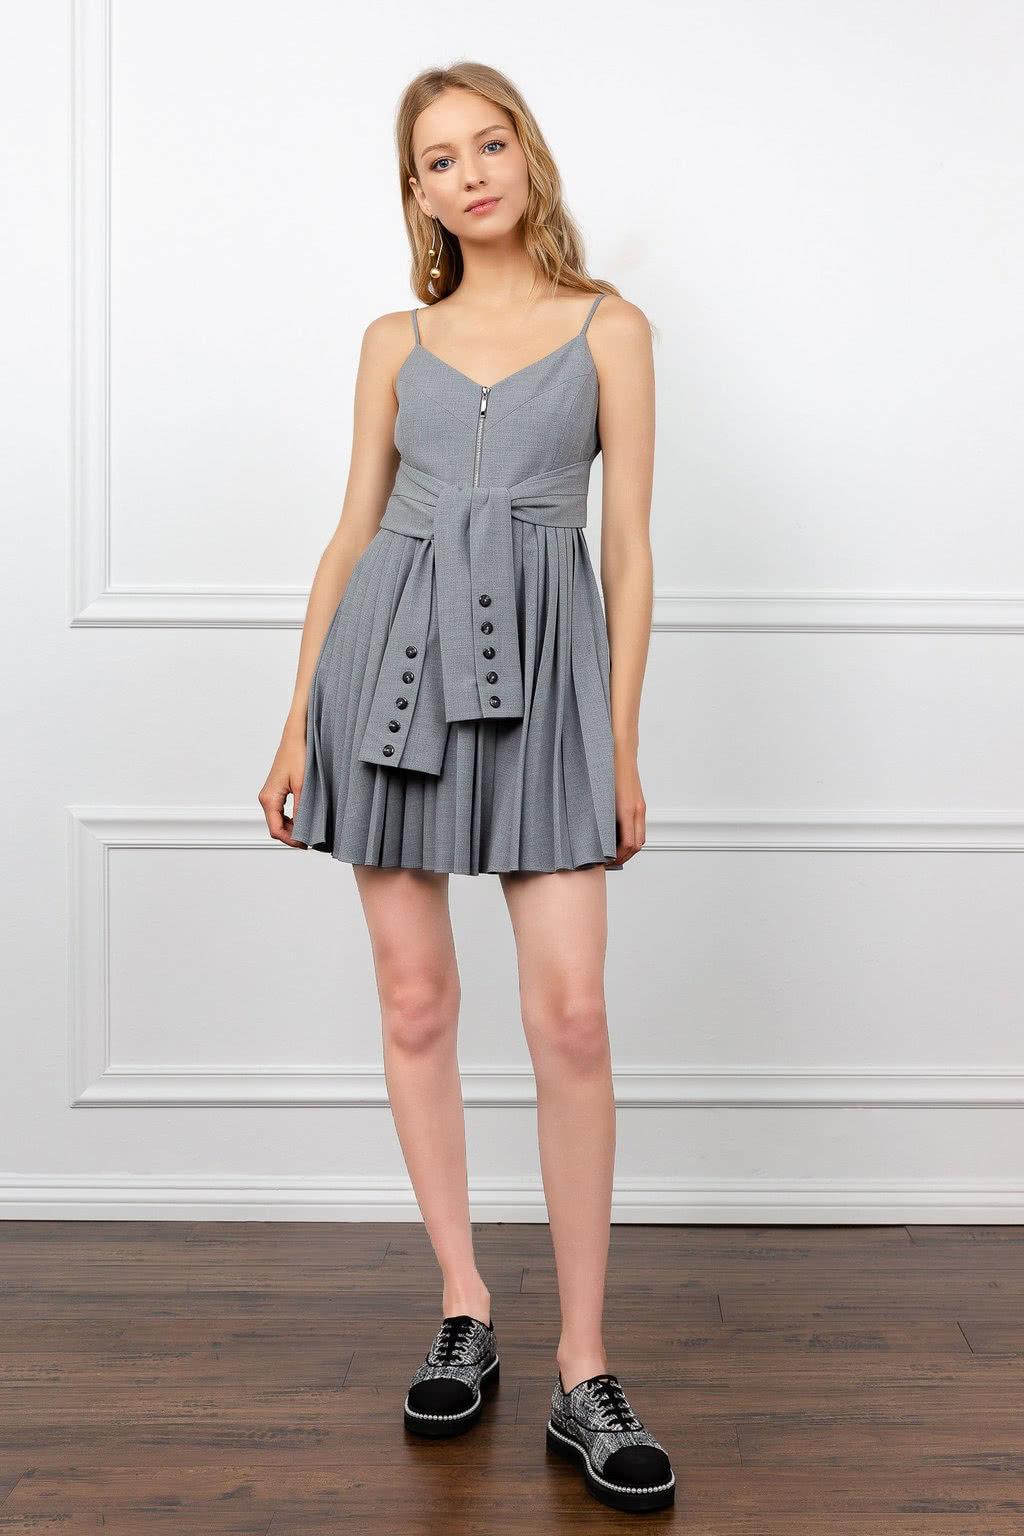 J.ING grey dress summer 2019 women - Luxe Digital